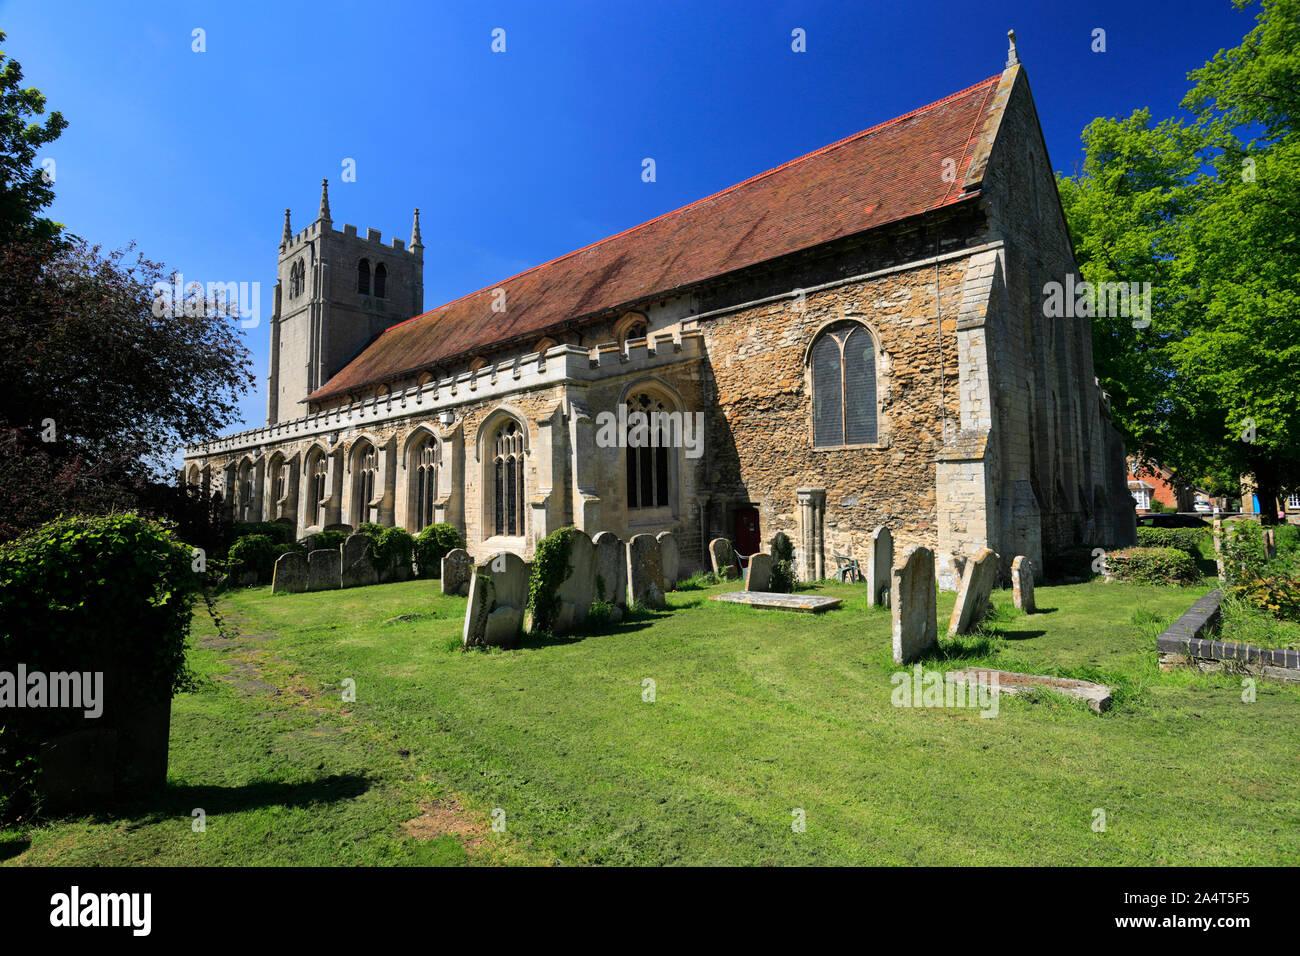 Summer, St Thomas a Becket Church, Ramsey village; Cambridgeshire; England; UK Stock Photo